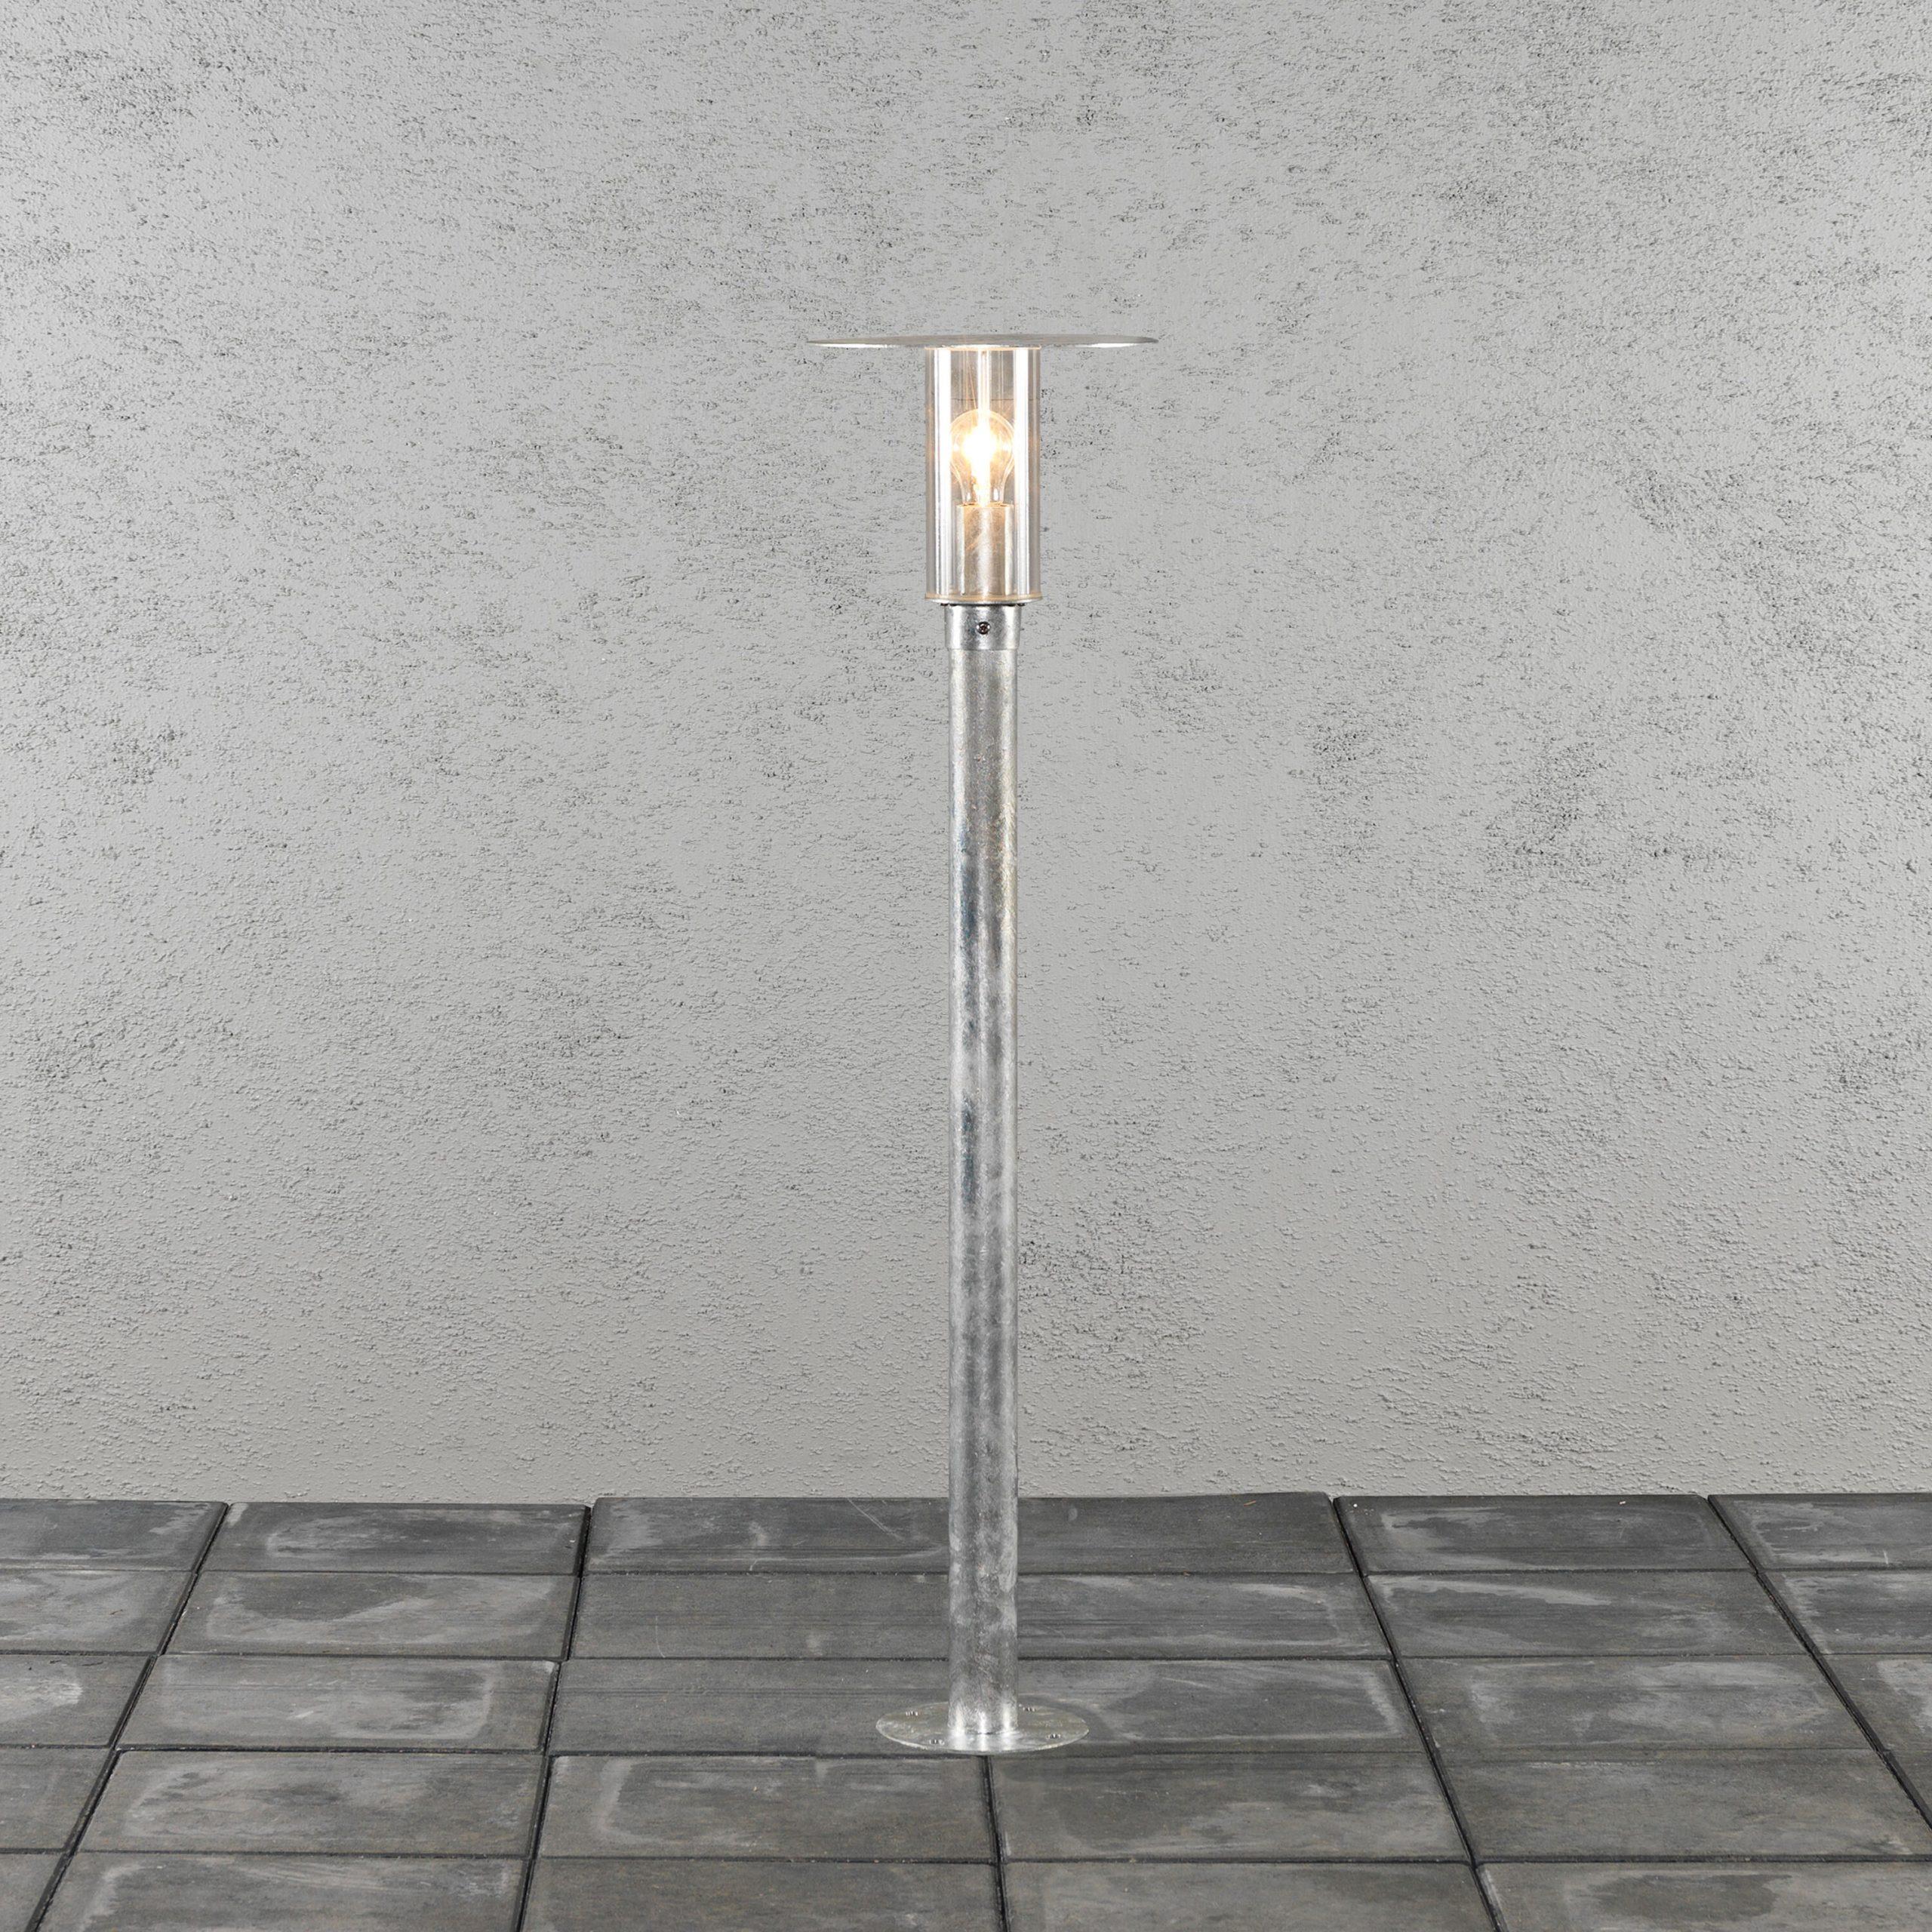 Konstsmide Buitenlamp 'Mode' Staande lamp, 111cm hoog, E27 max 60W / 230V | Konstsmide